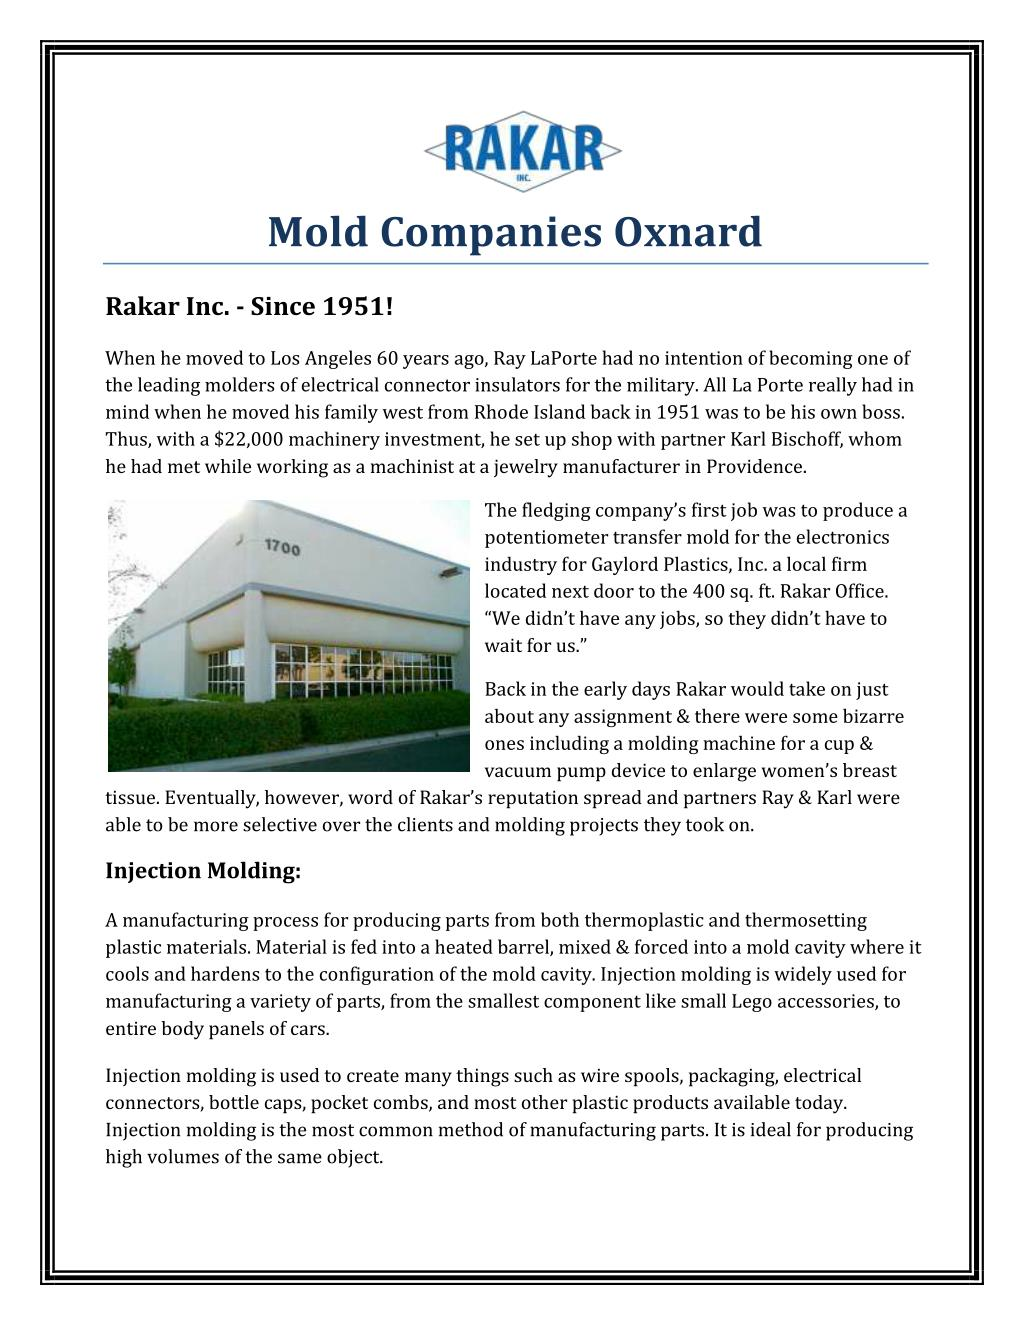 PPT - Mold Companies Oxnard PowerPoint Presentation - ID:7226065